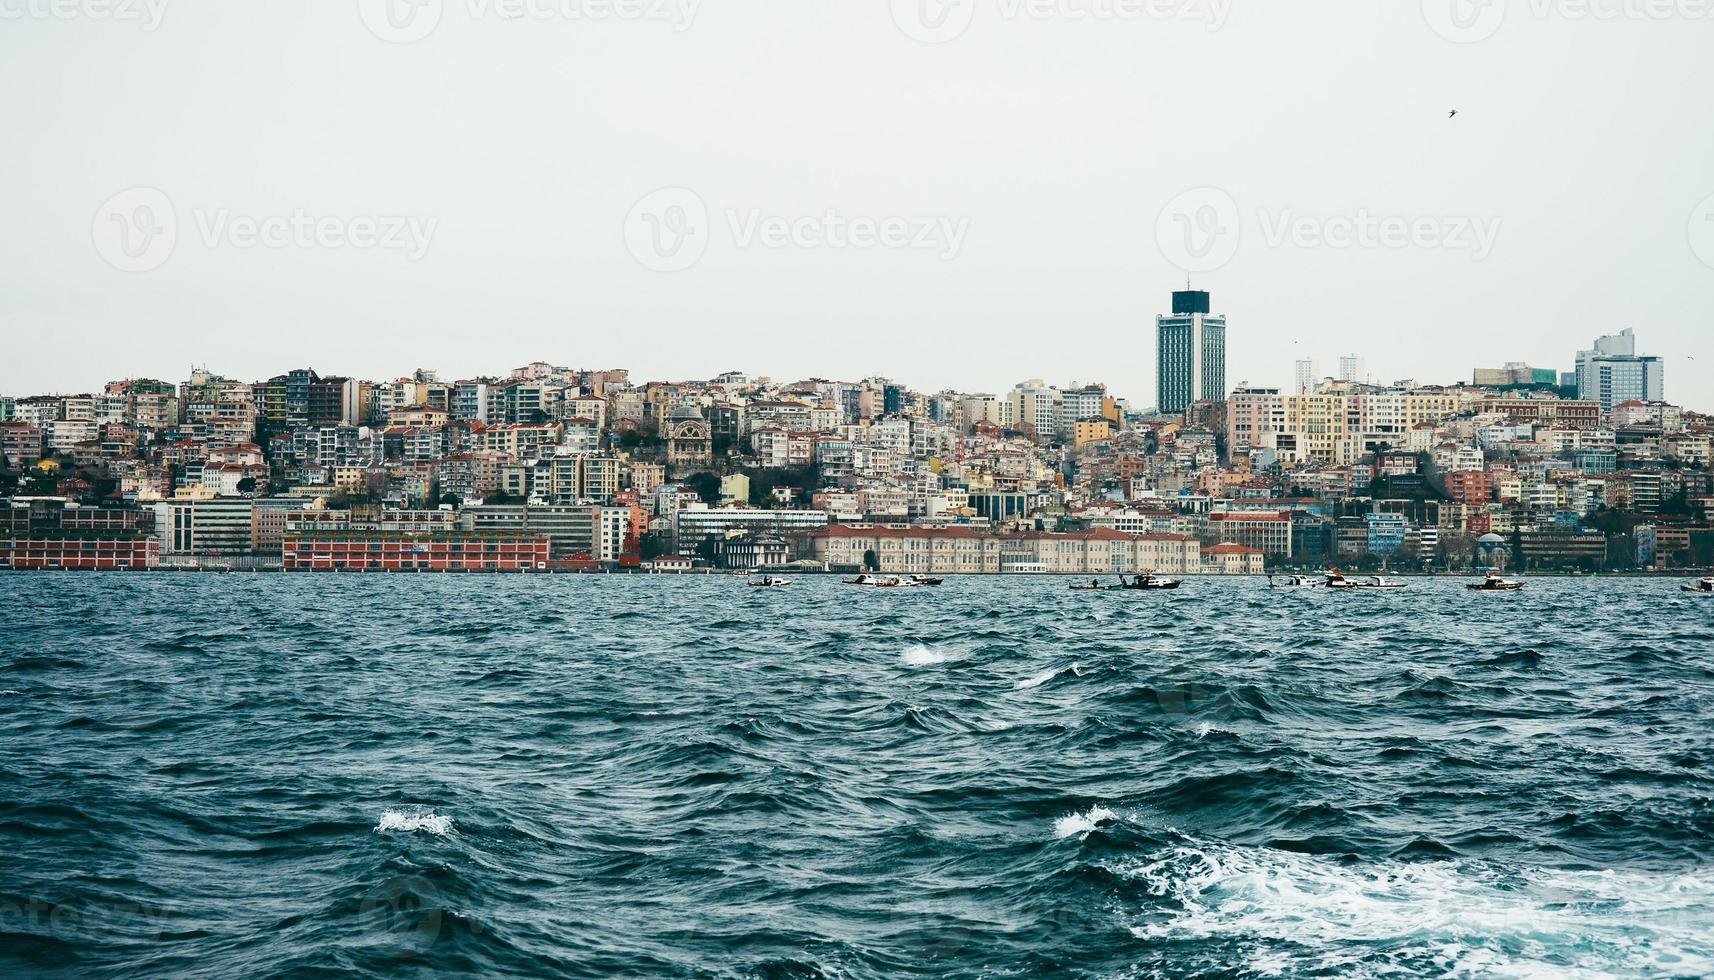 vue d'istanbul, босфорский пролив photo